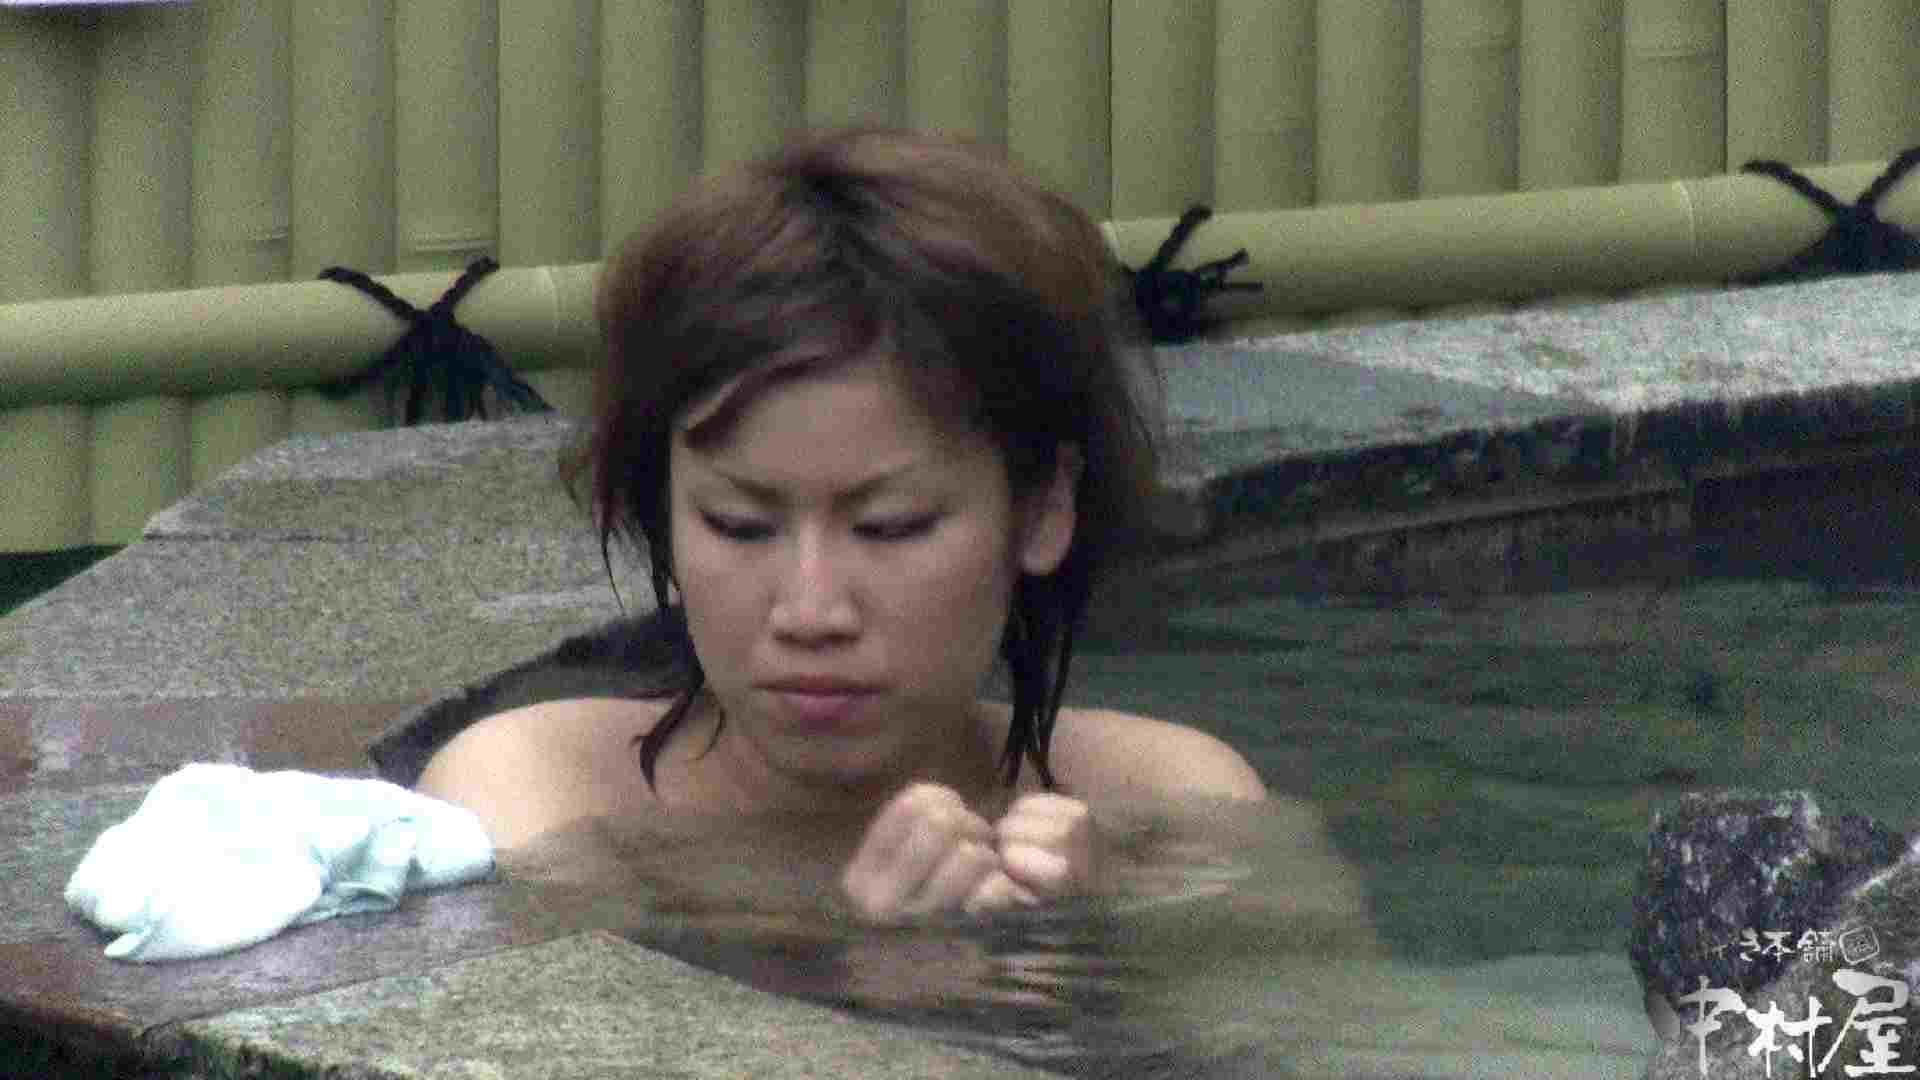 Aquaな露天風呂Vol.918 盗撮師作品  75pic 63